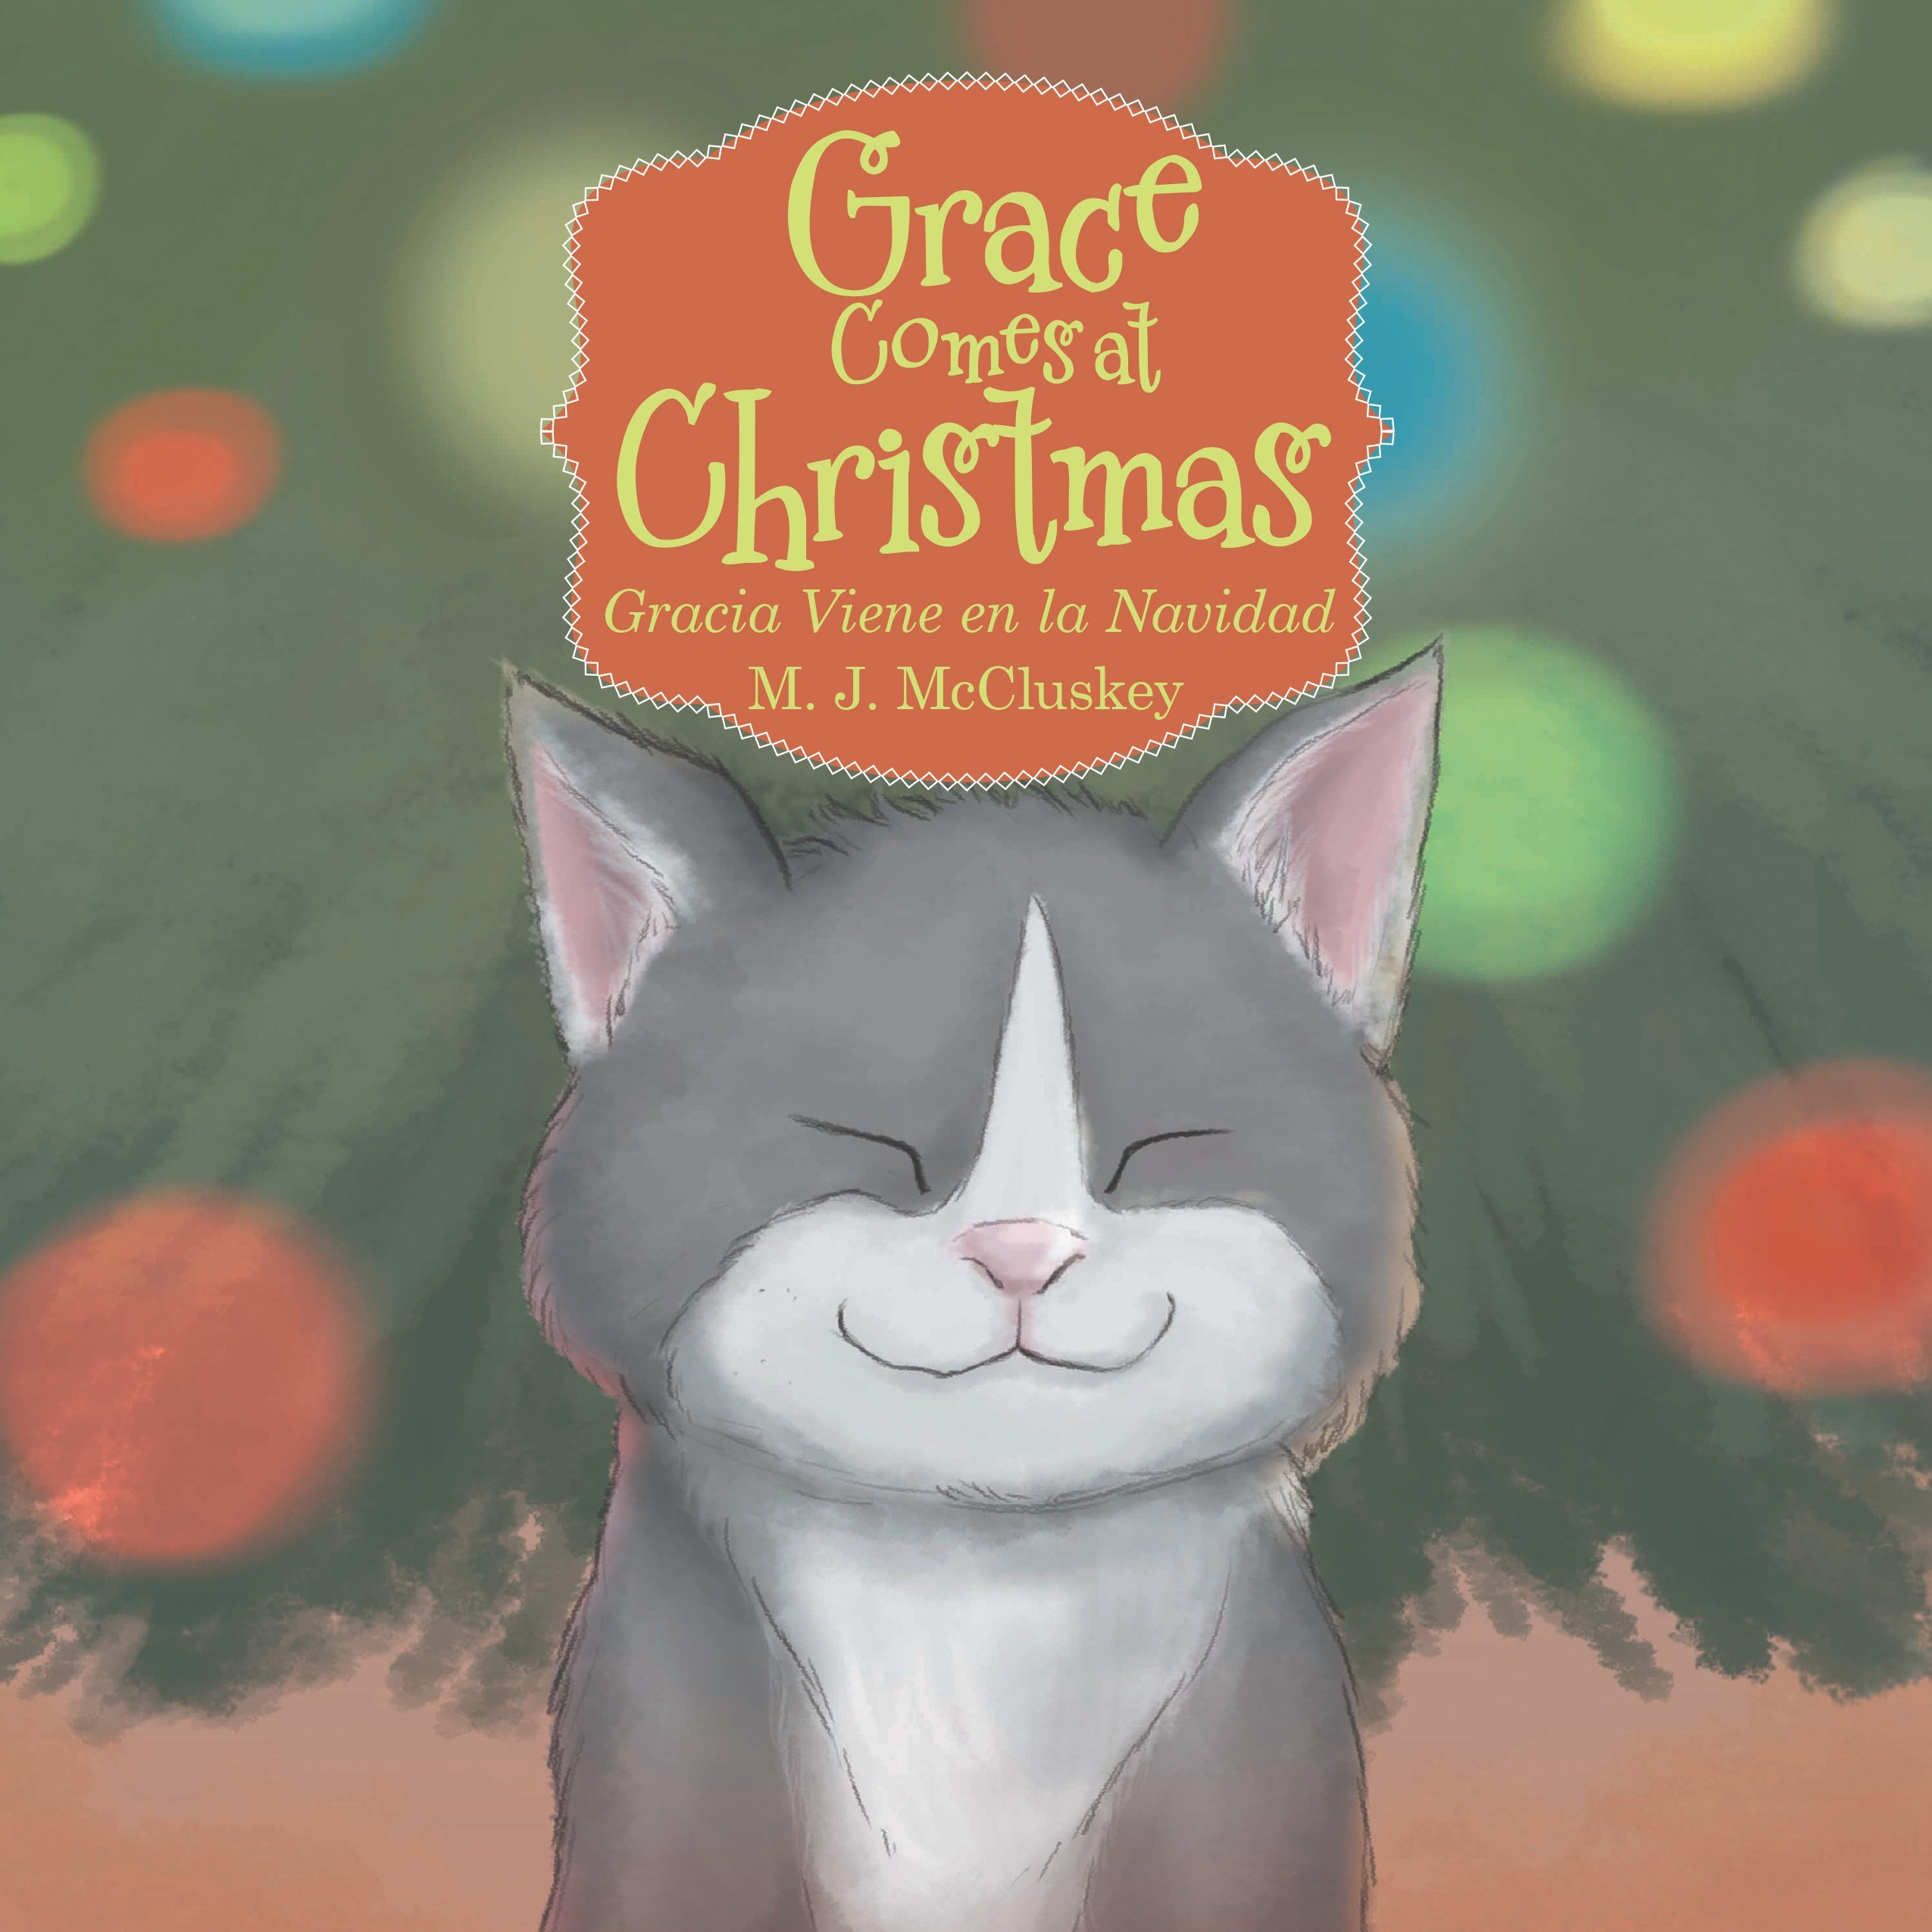 Grace Comes at Christmas: Gracia Viene En La Navidad by Balboa Press (Image #1)